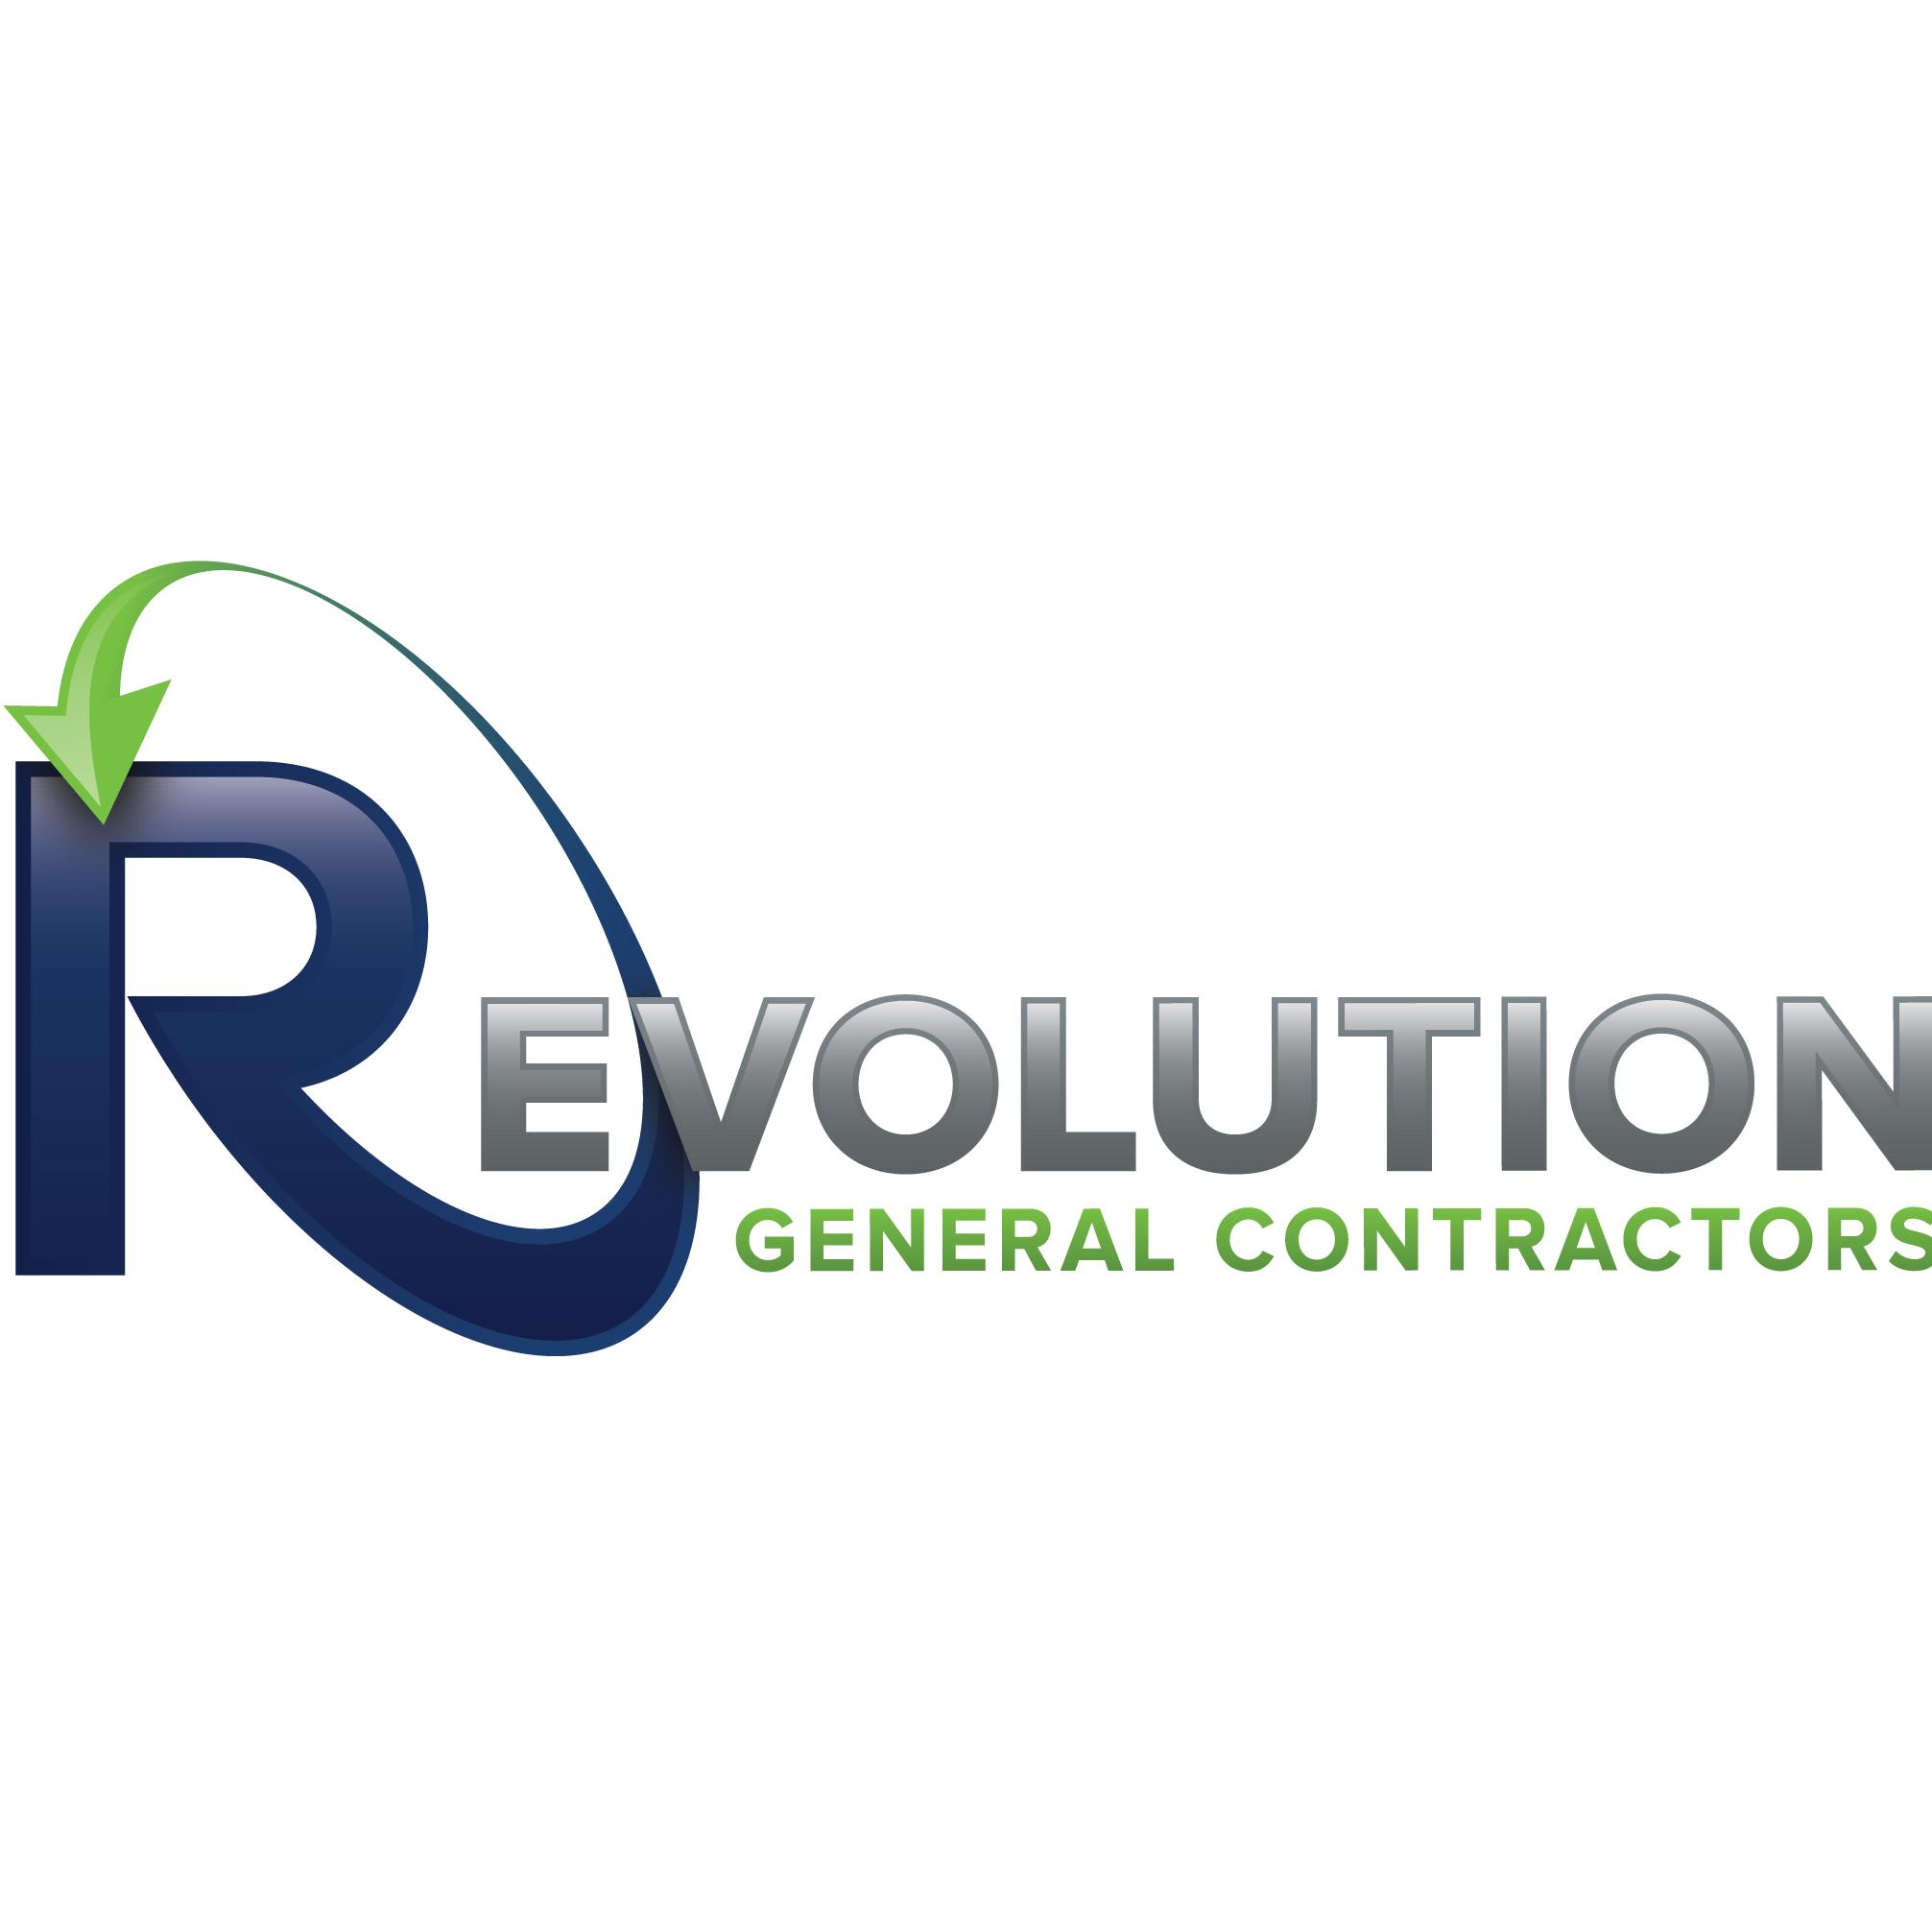 Revolution General Contractors